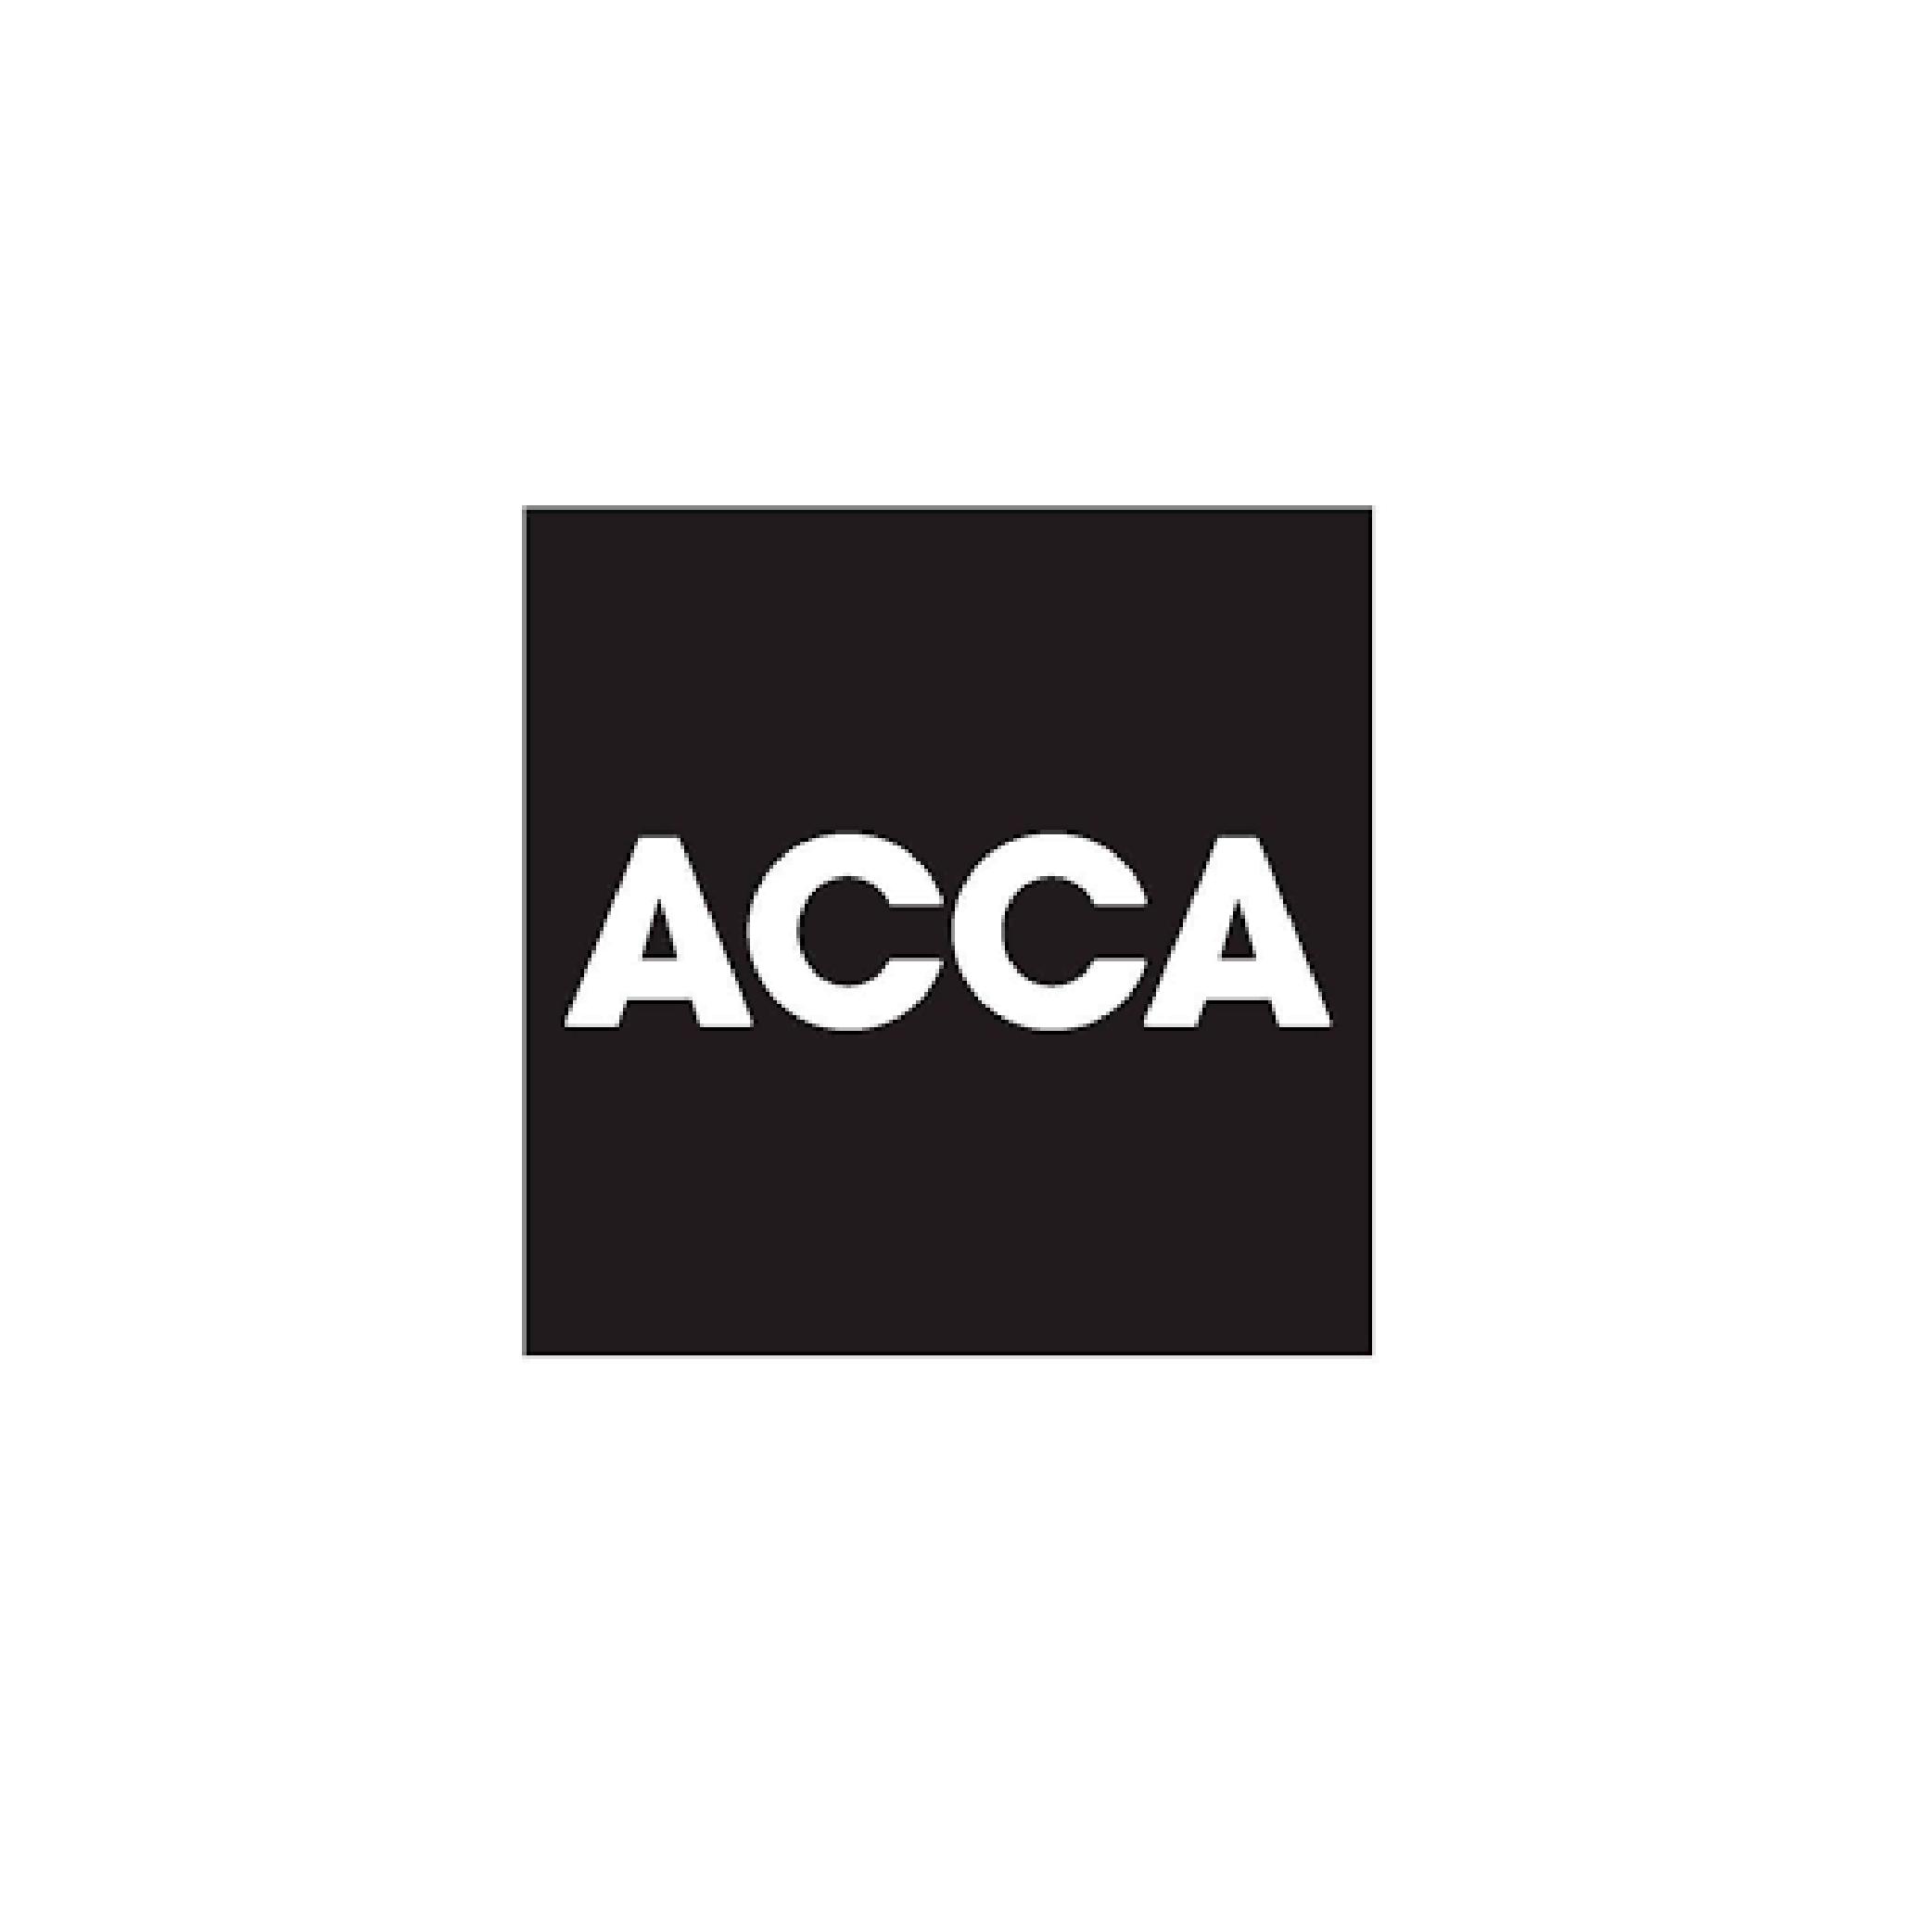 ACCA logo-01